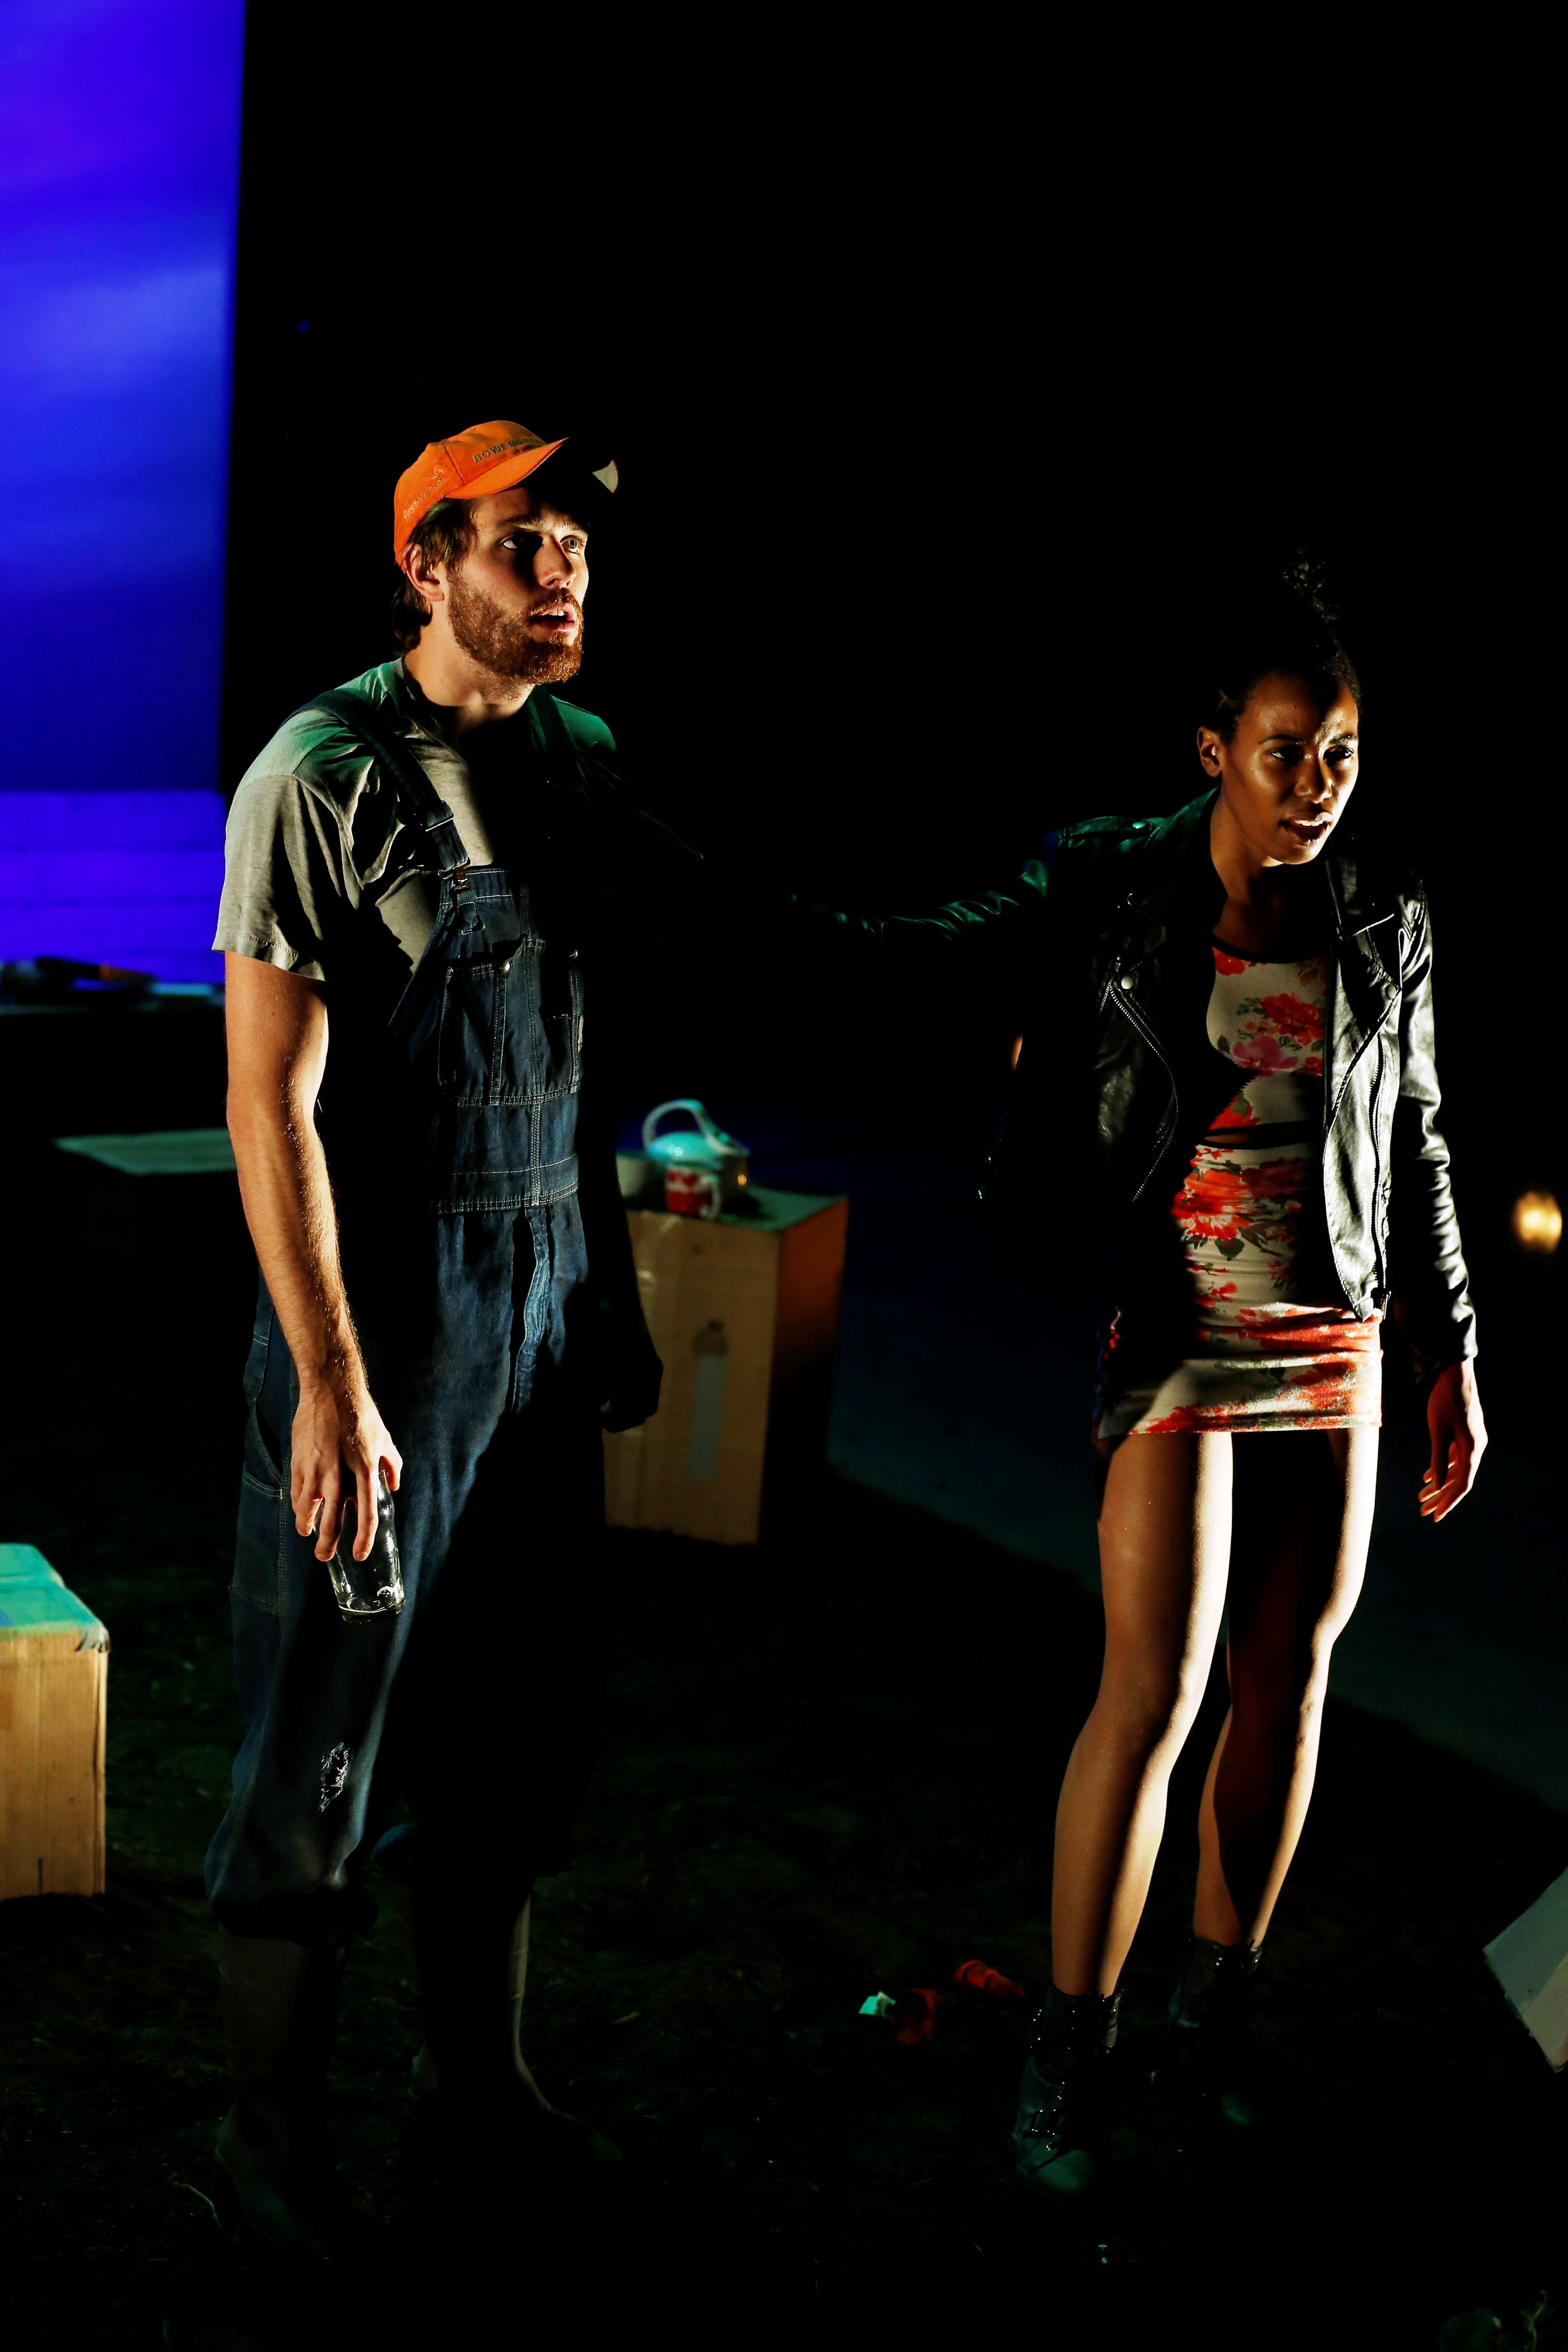 Lee Khole - Production Photo #5.JPG